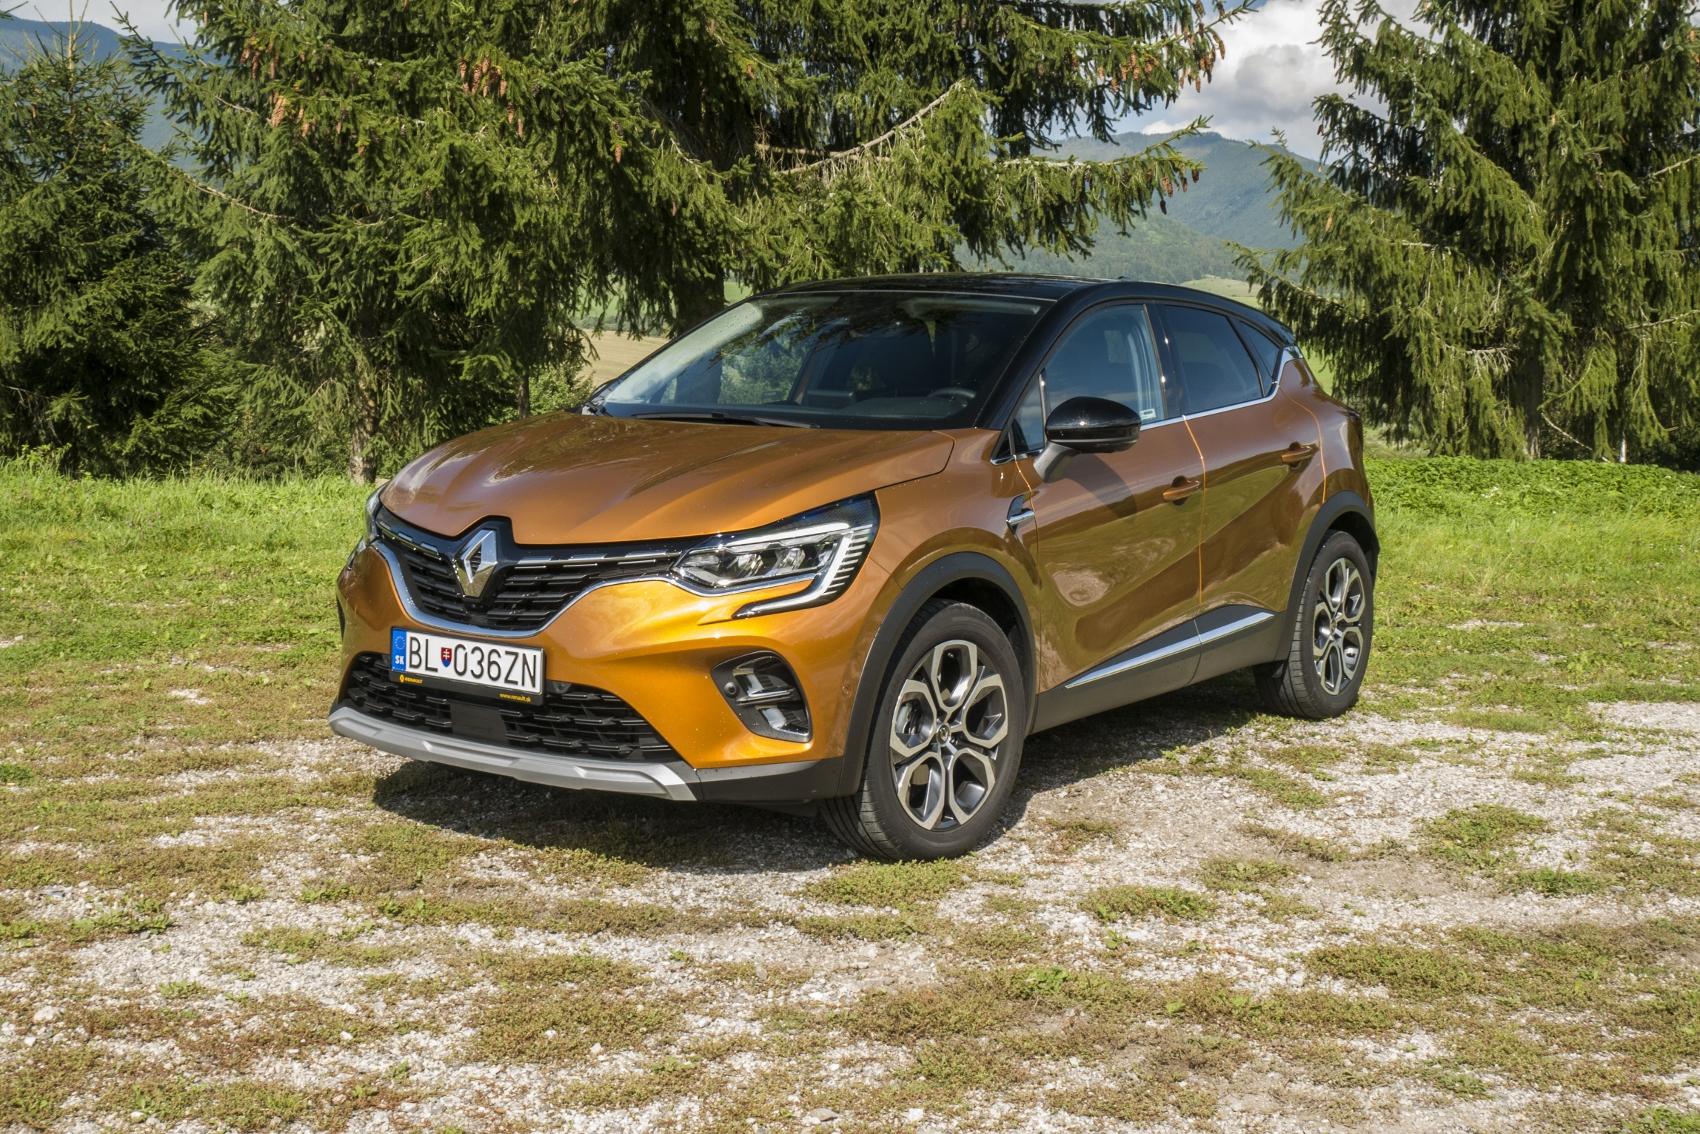 Test: V interiéri sa Renault Captur tvári ako o triedu drahšie auto JHlpsqZmLz renault-captur-1